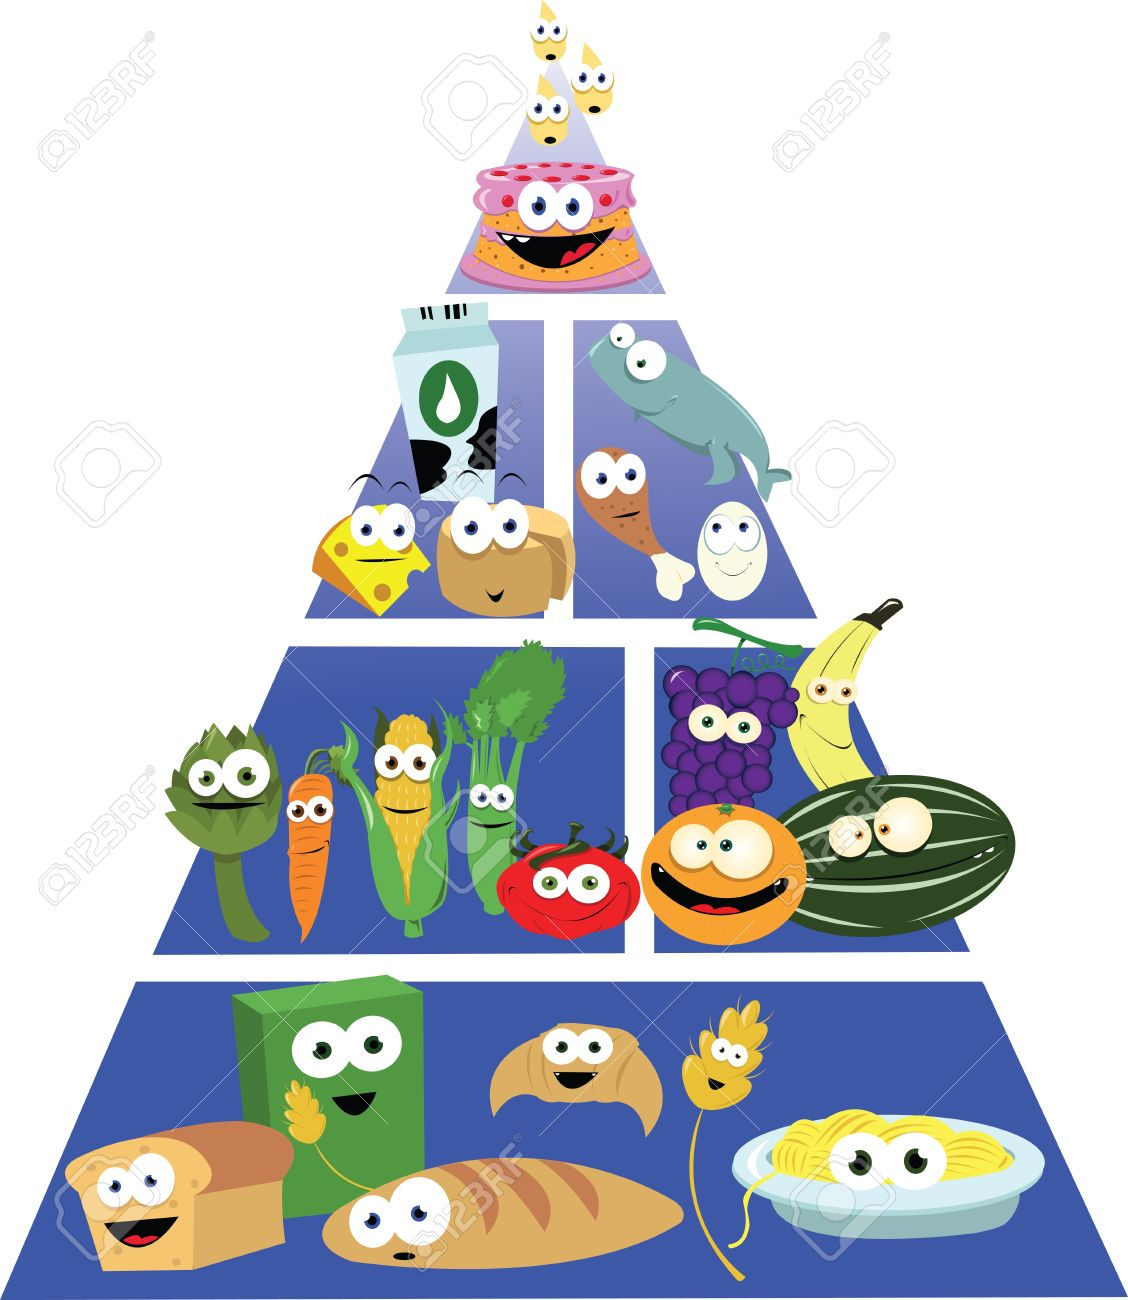 food pyramid: A cartoon representing a funny food pyramid Illustration